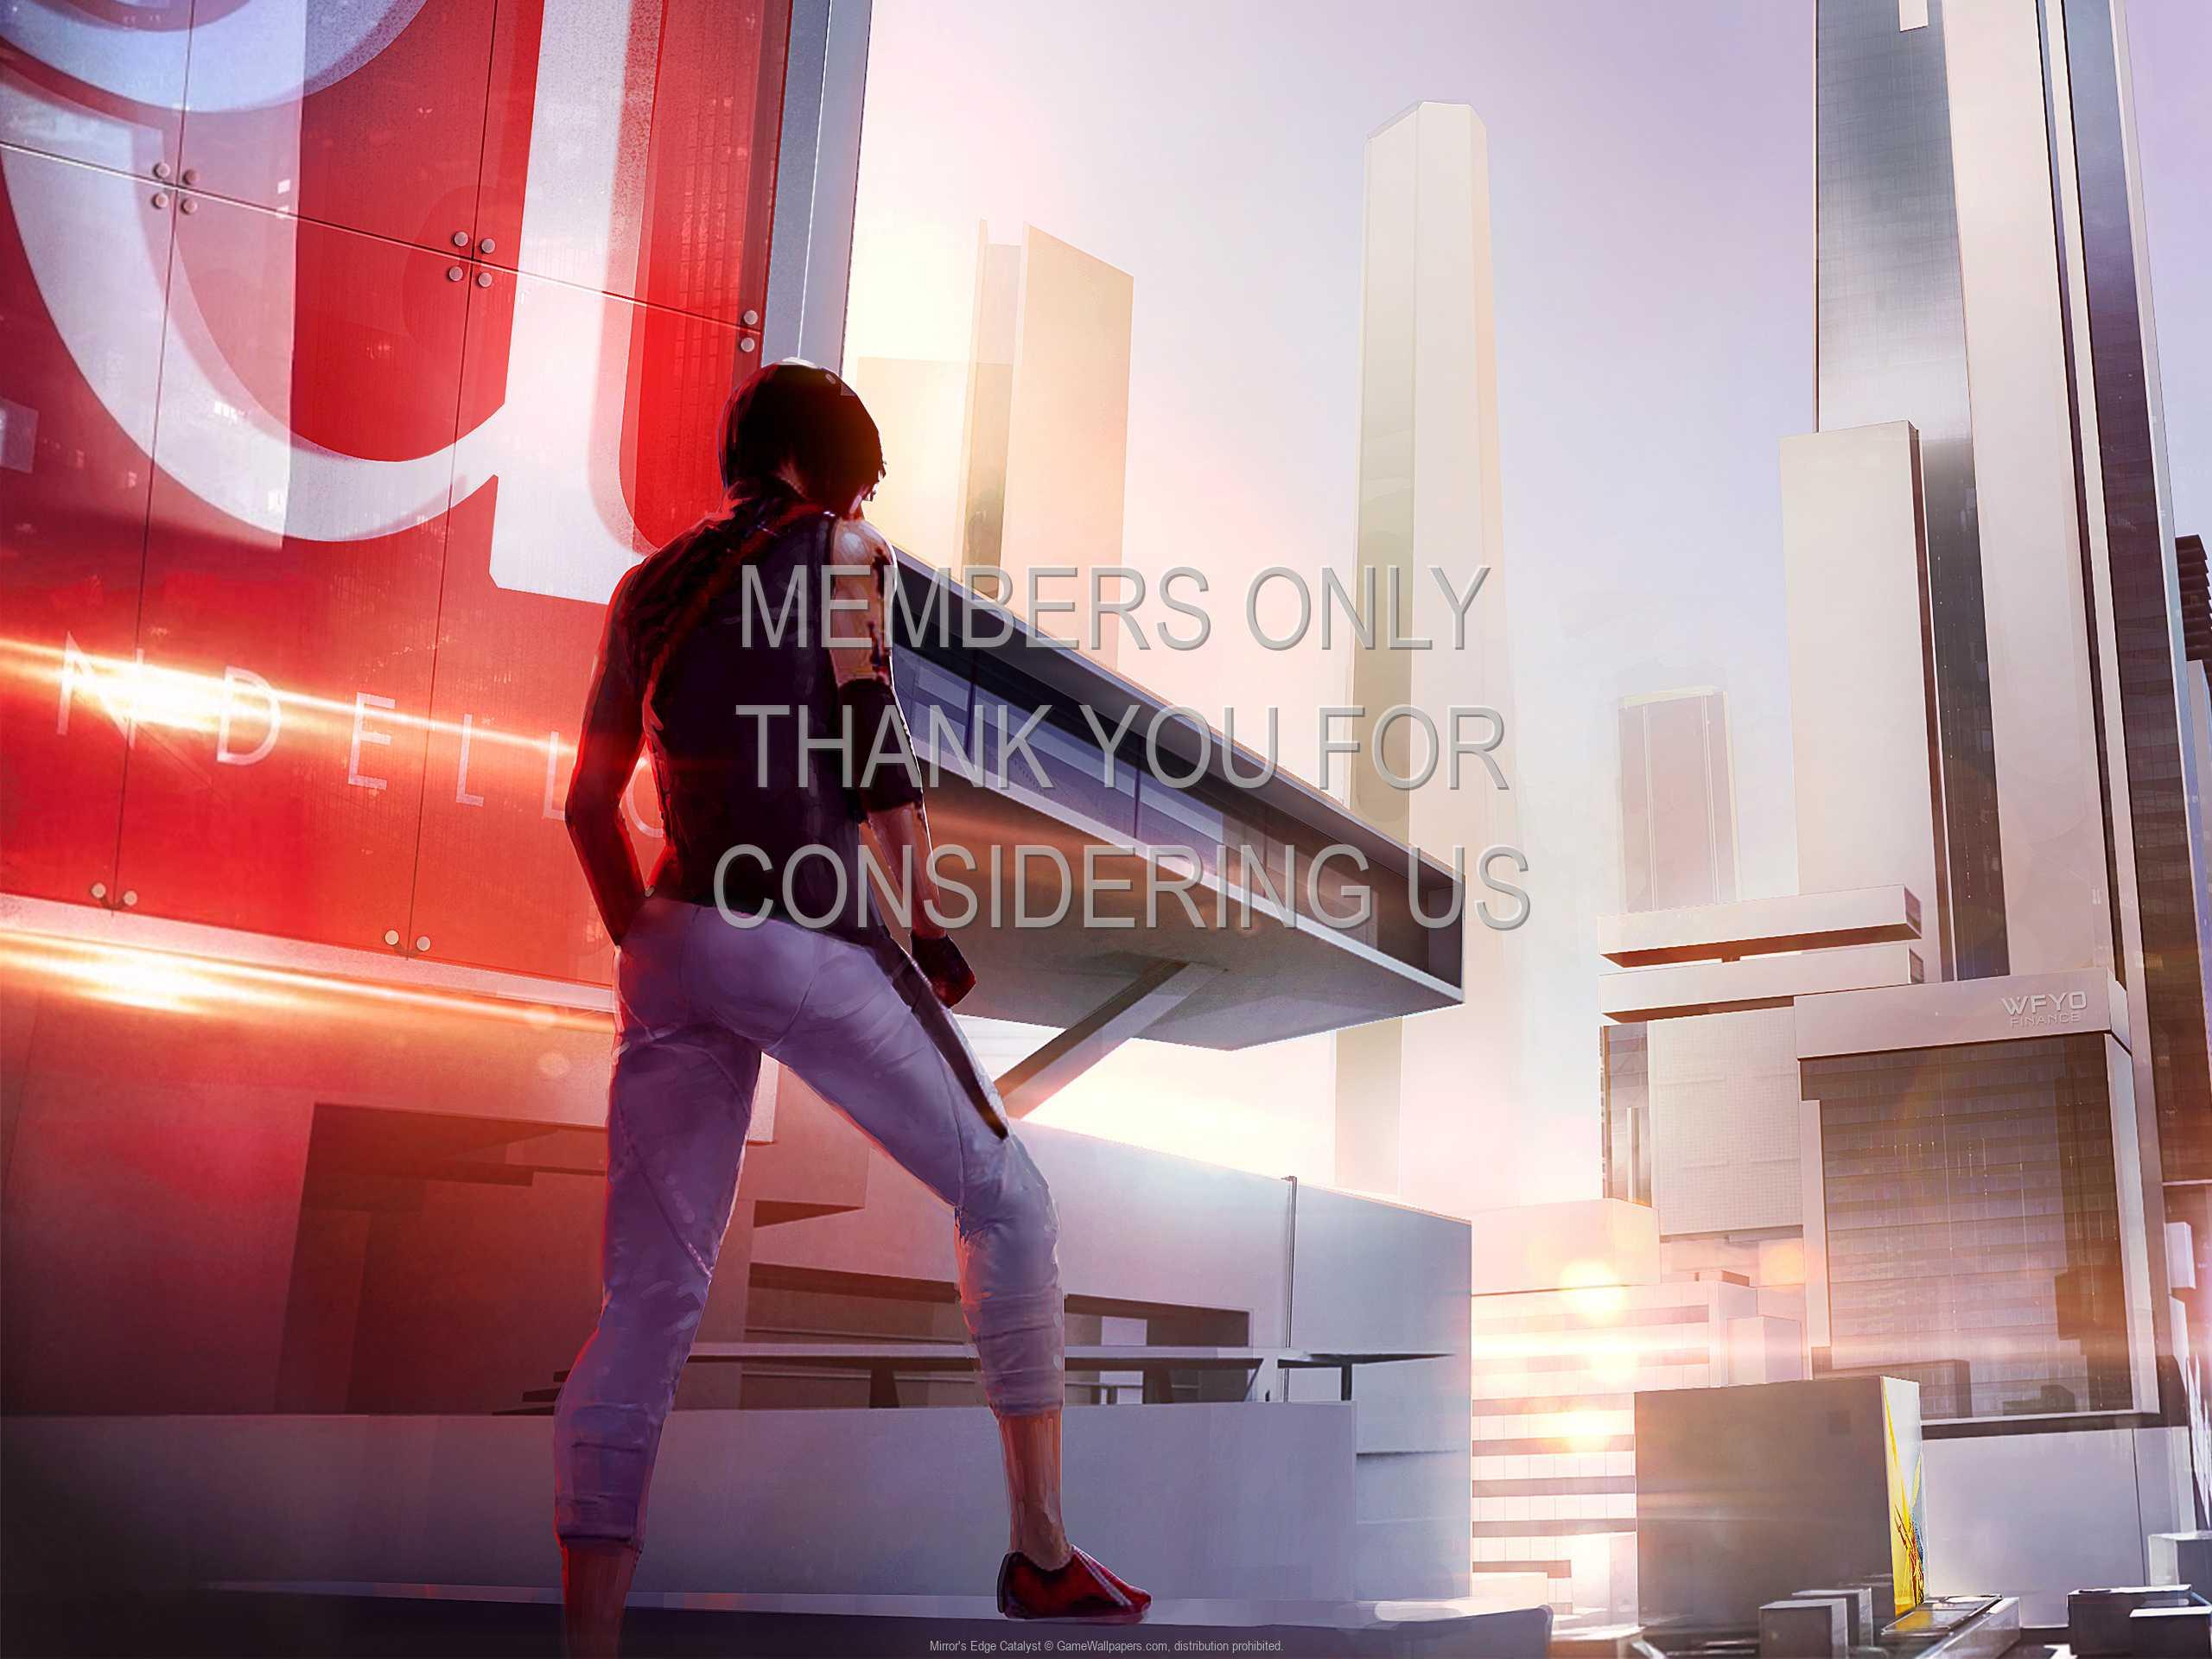 Mirror's Edge: Catalyst 1080p Horizontal Mobile wallpaper or background 07